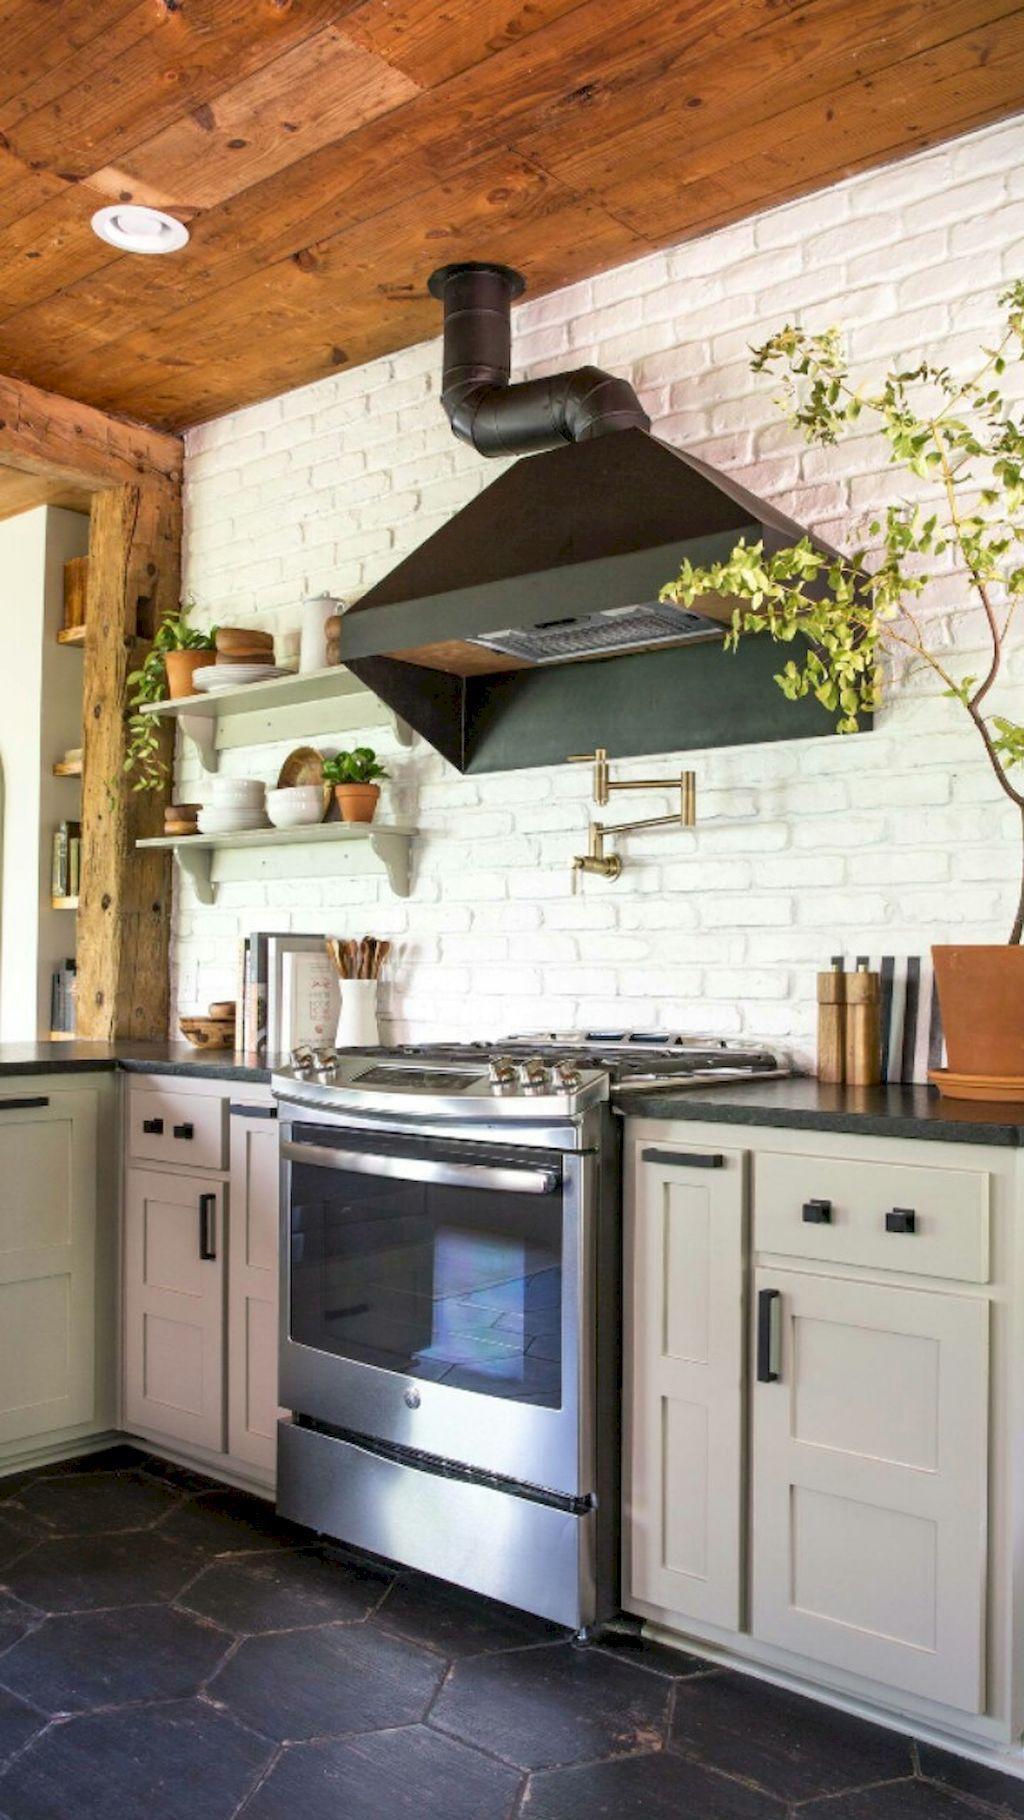 70 Tile Floor Farmhouse Kitchen Decor Ideas 57 Kitchen Tiles